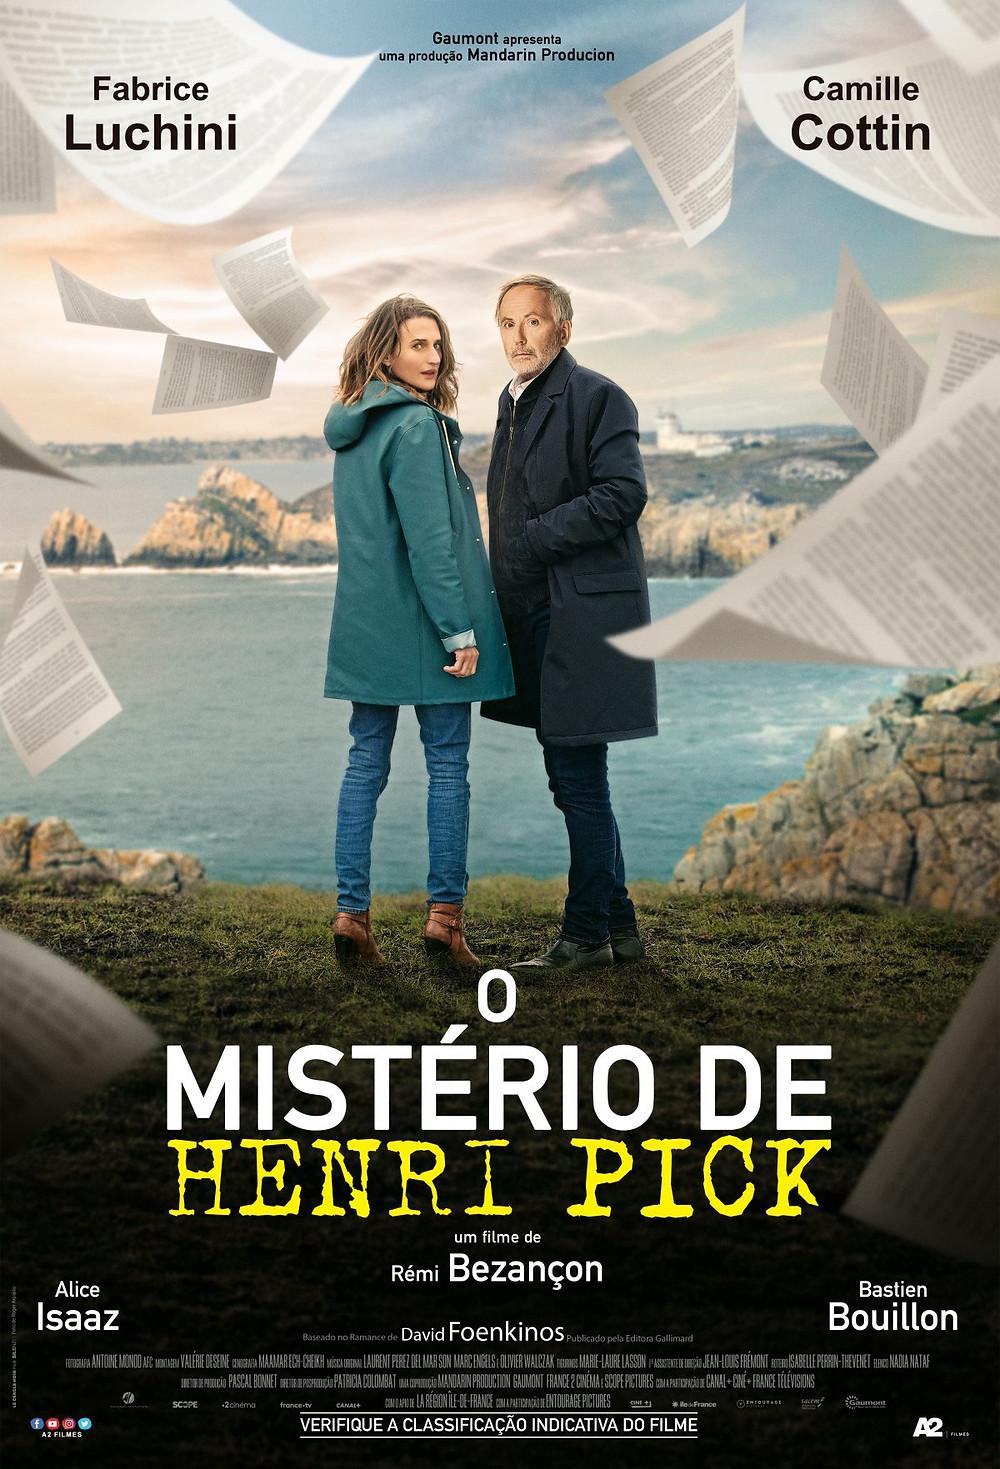 Filme O Mistério de Henri Pick (Le Mystère Henri Pick: 2019)